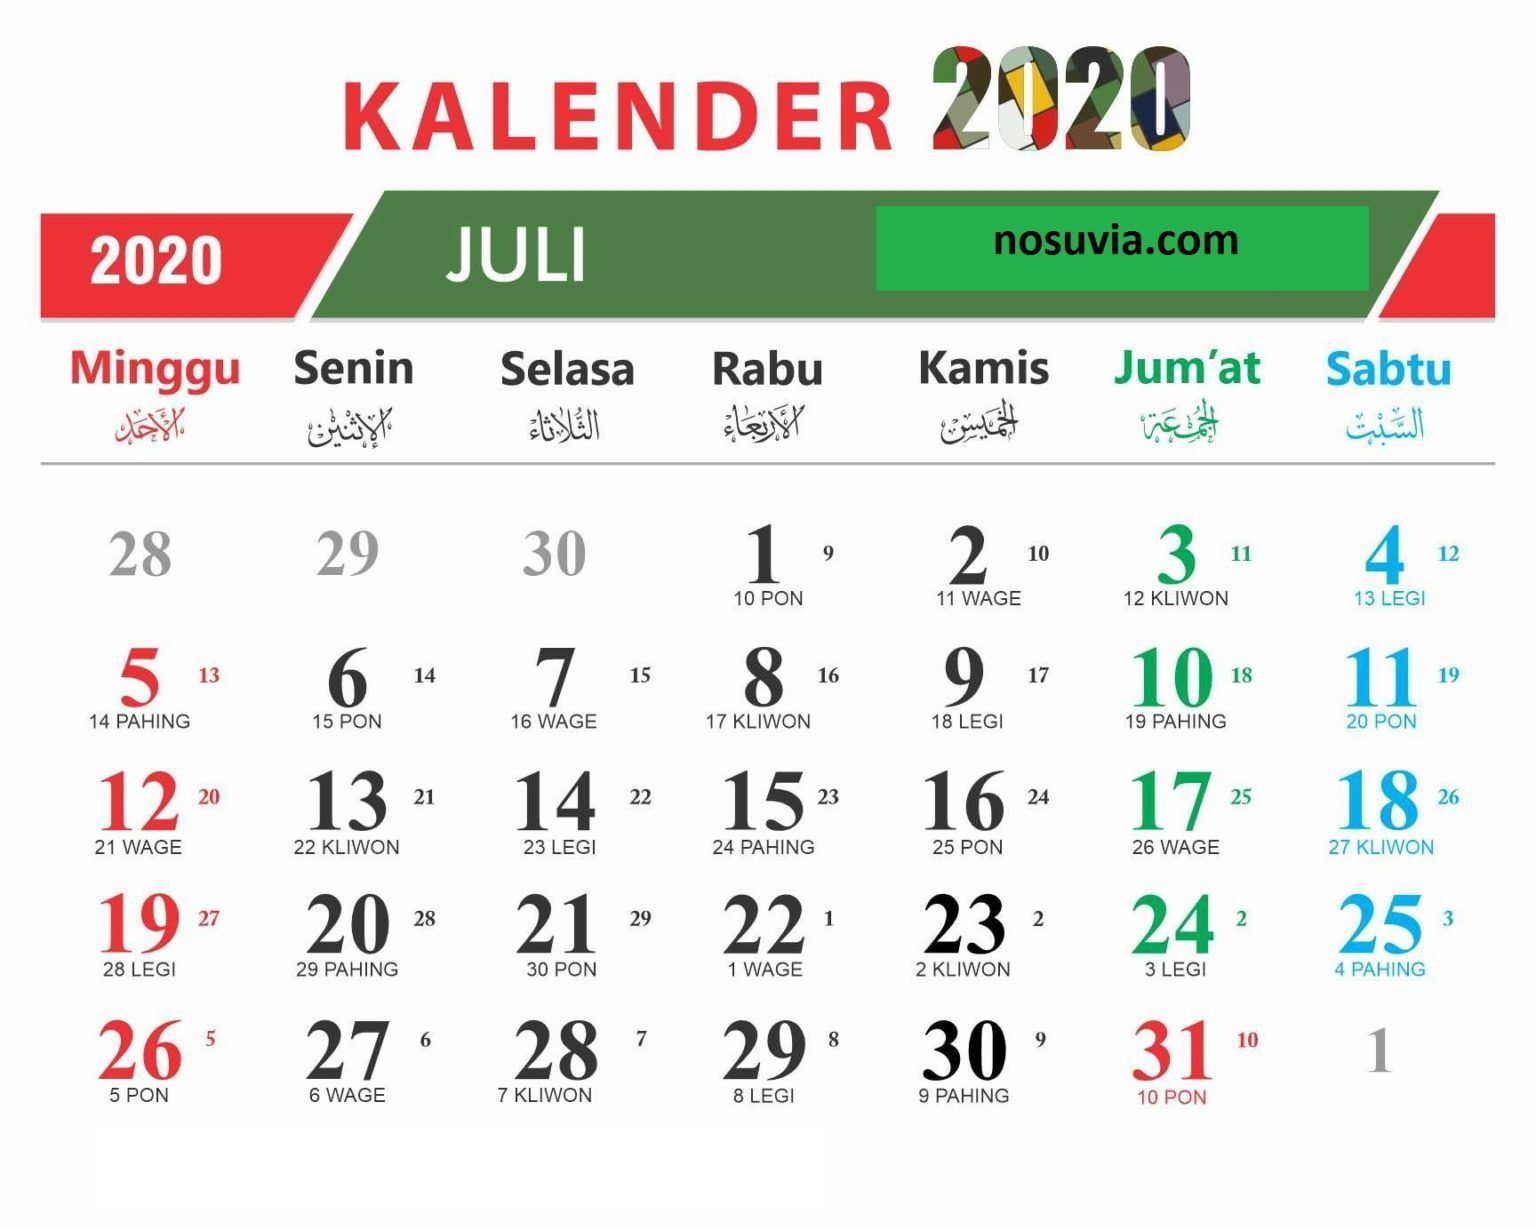 006 Breathtaking 2019 Calendar Template Word 2007 Inspiration Full